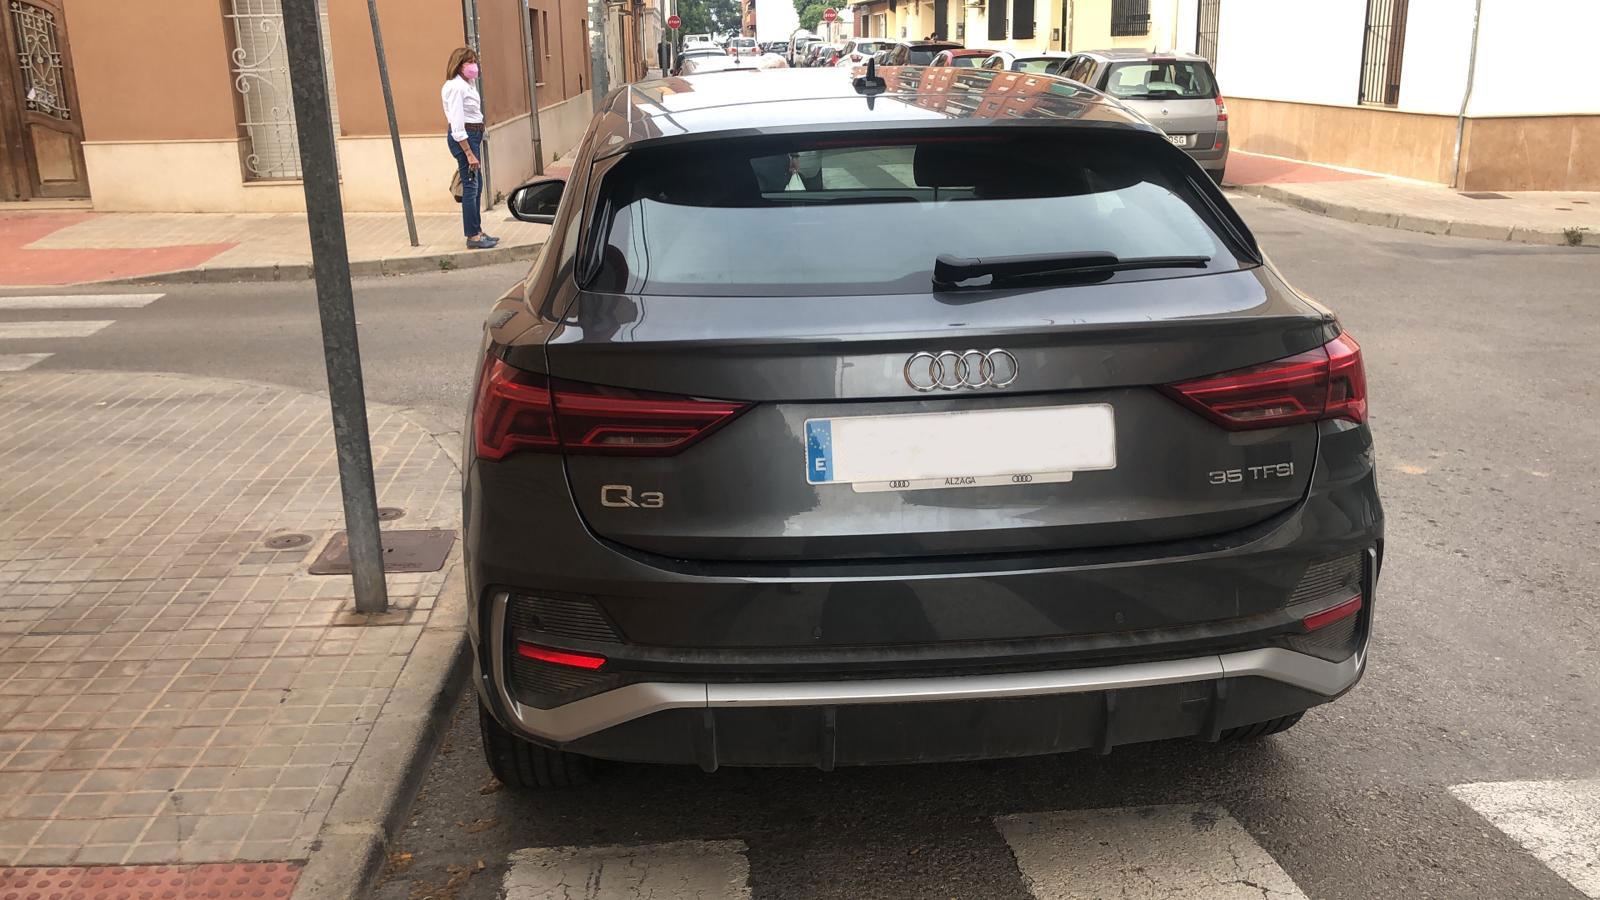 Audi-Q3-Sportback-TSFI-Rental-Ibiza-2